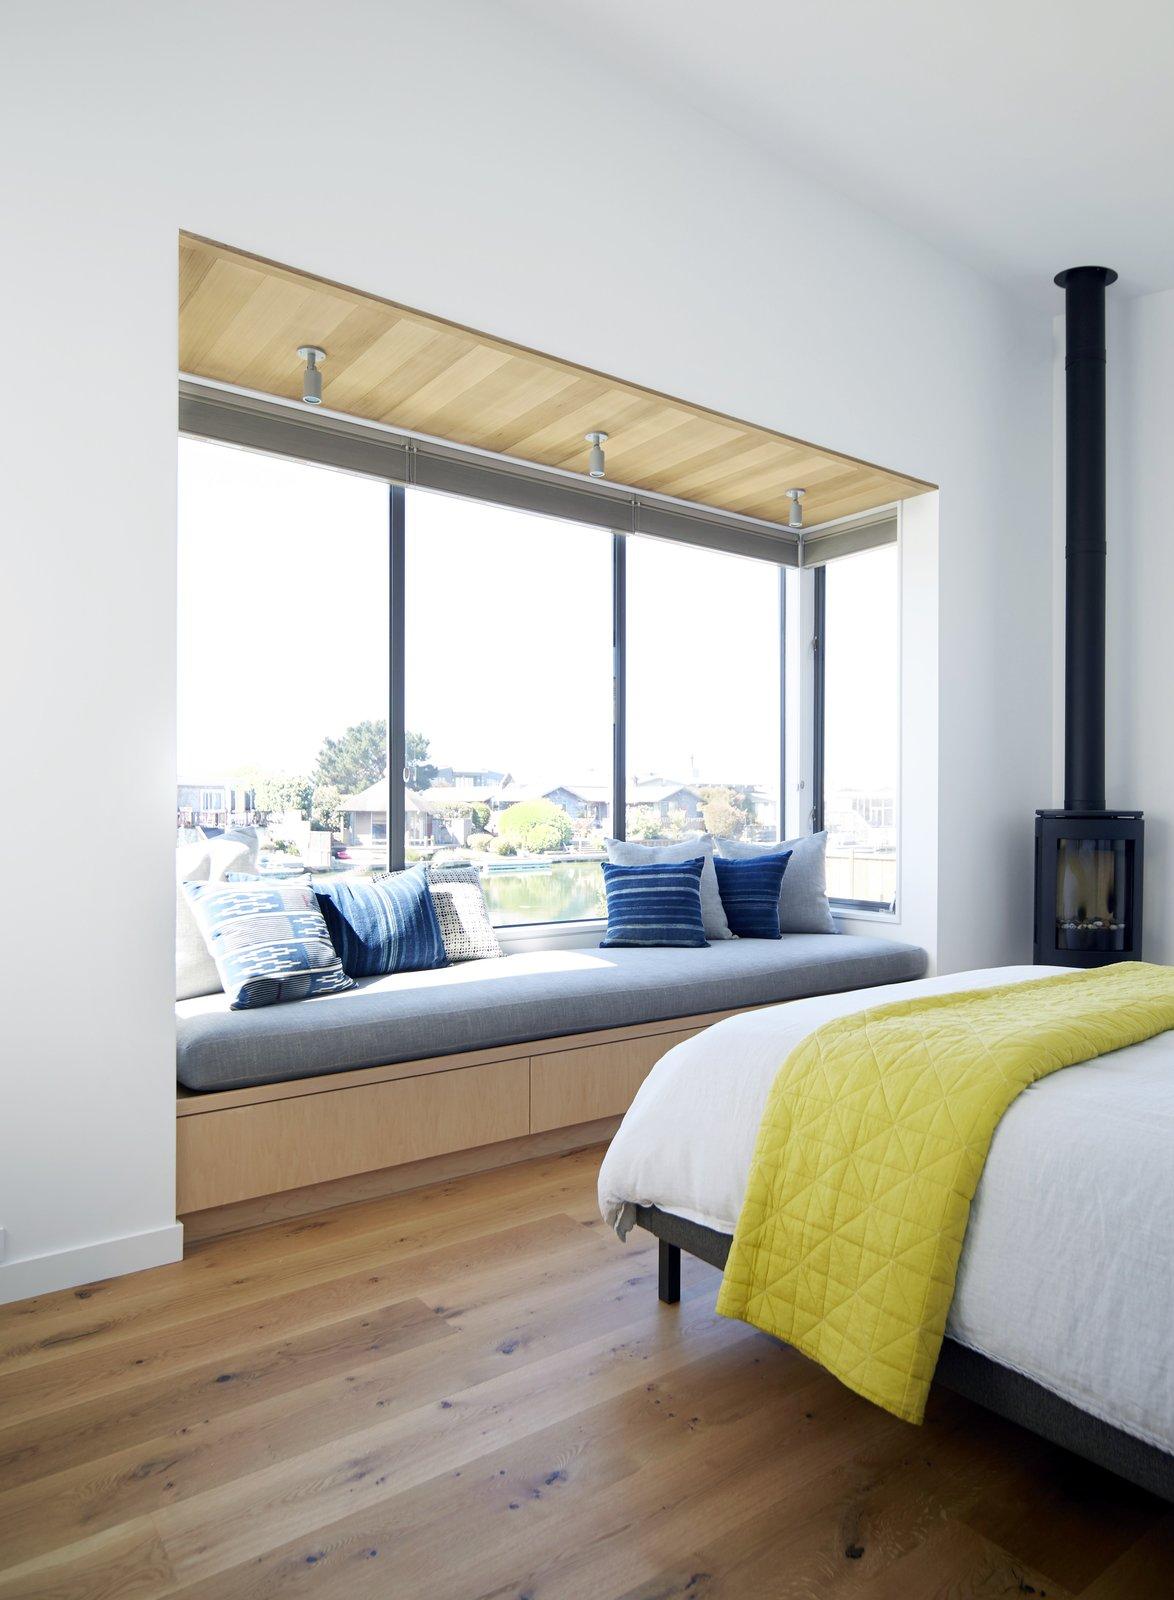 #TurnbullGriffinHaesloop #interior #bedroom #windowseat #woodburningstove    Stinson Beach Lagoon Residence by Turnbull Griffin Haesloop Architects